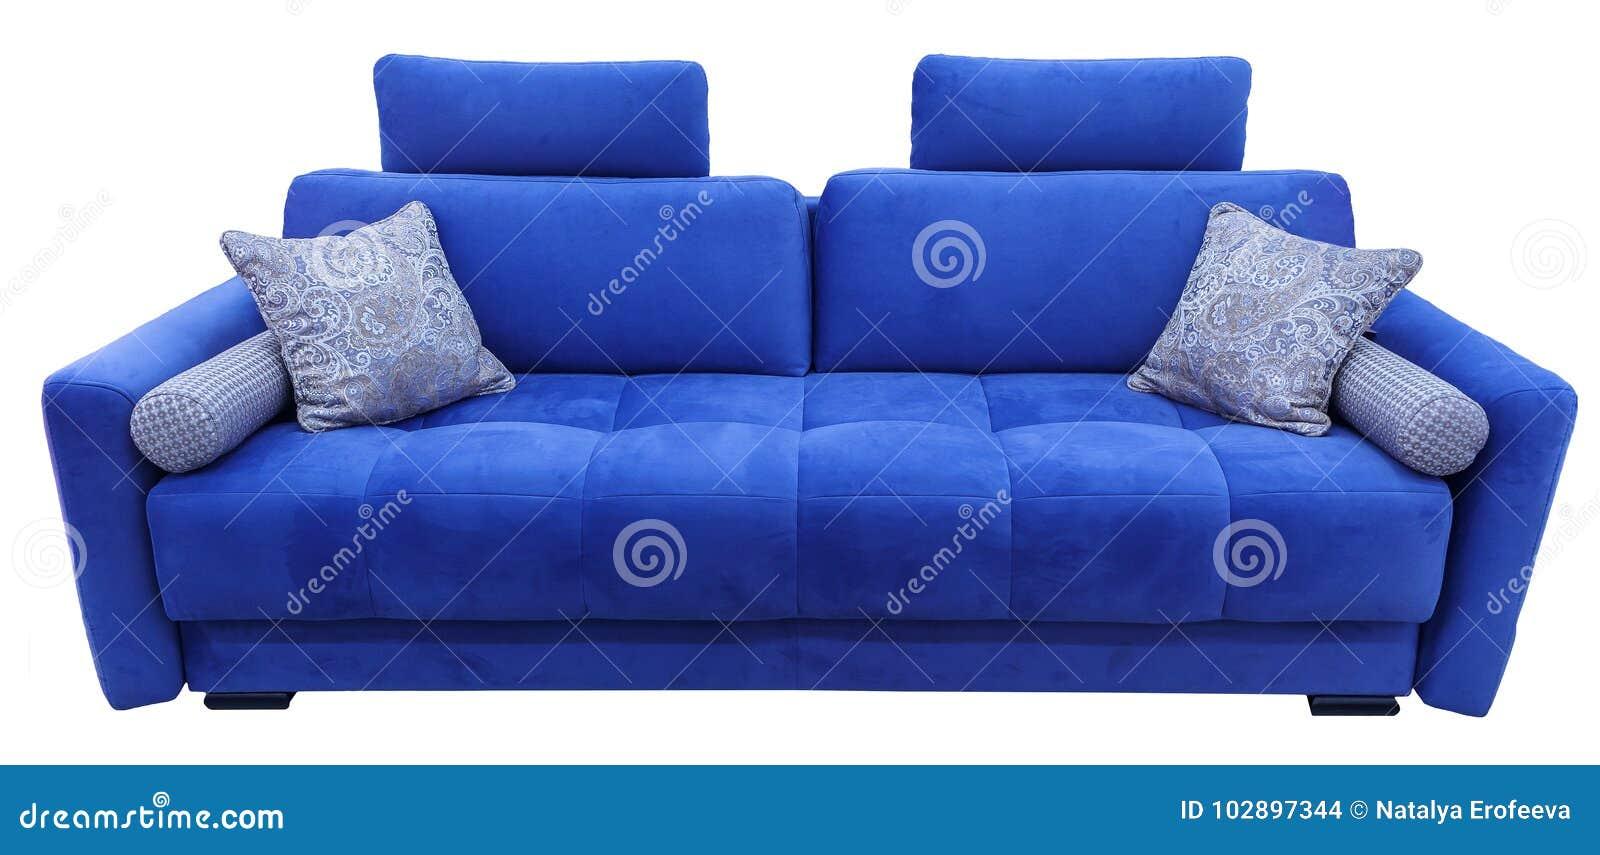 Blue Sofa Soft Velour Fabric Couch Classic Modern Divan On